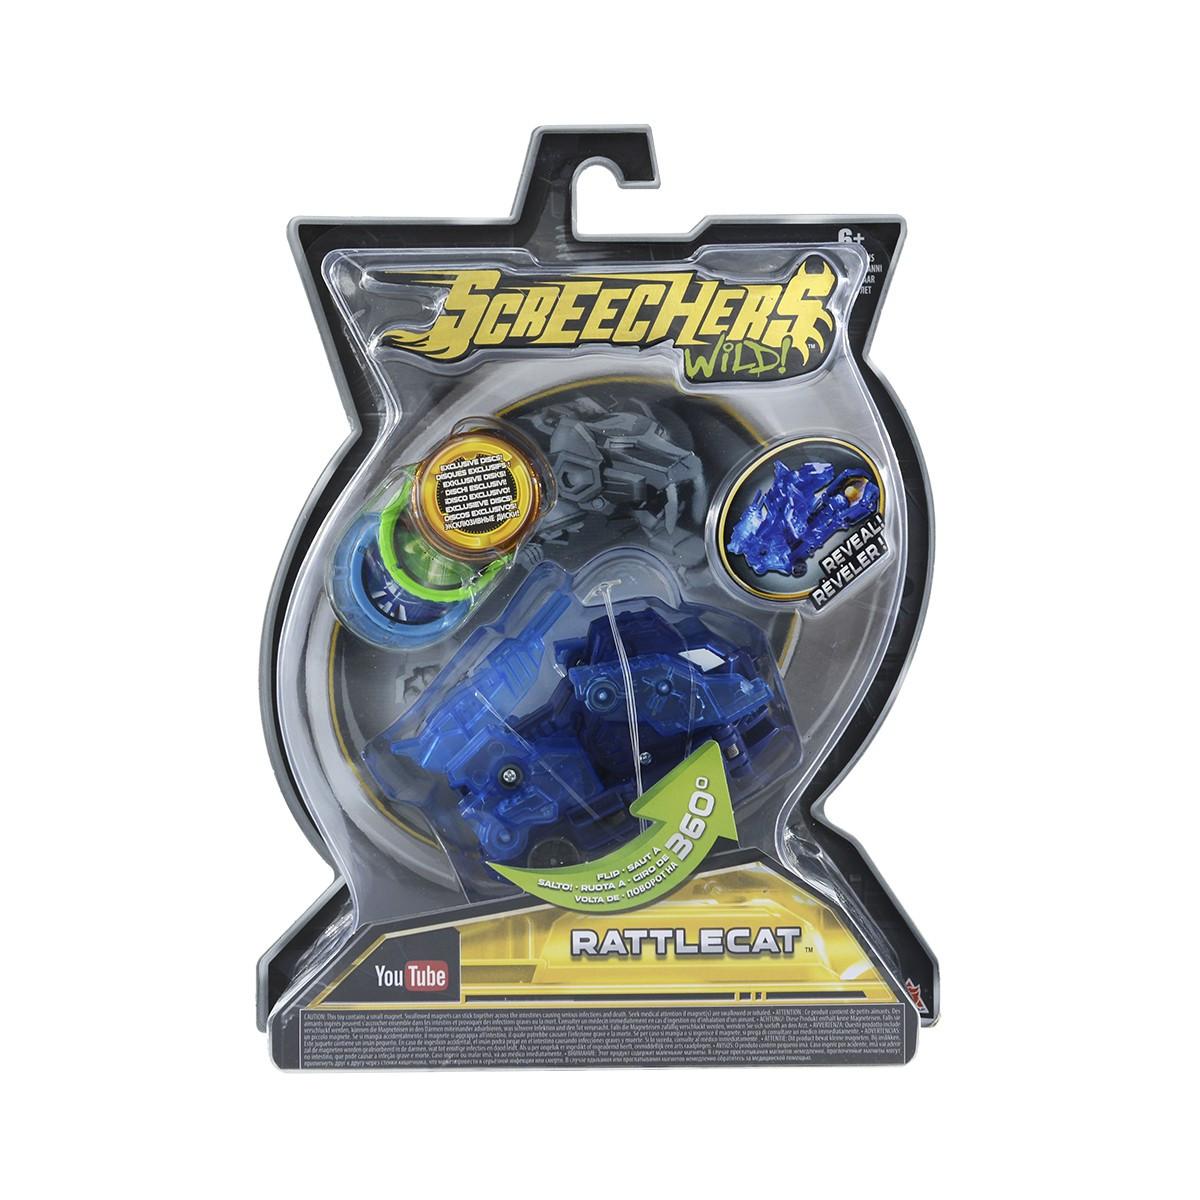 Машинка-Трансформер Screechers Wild! L 2 - Реттлкет